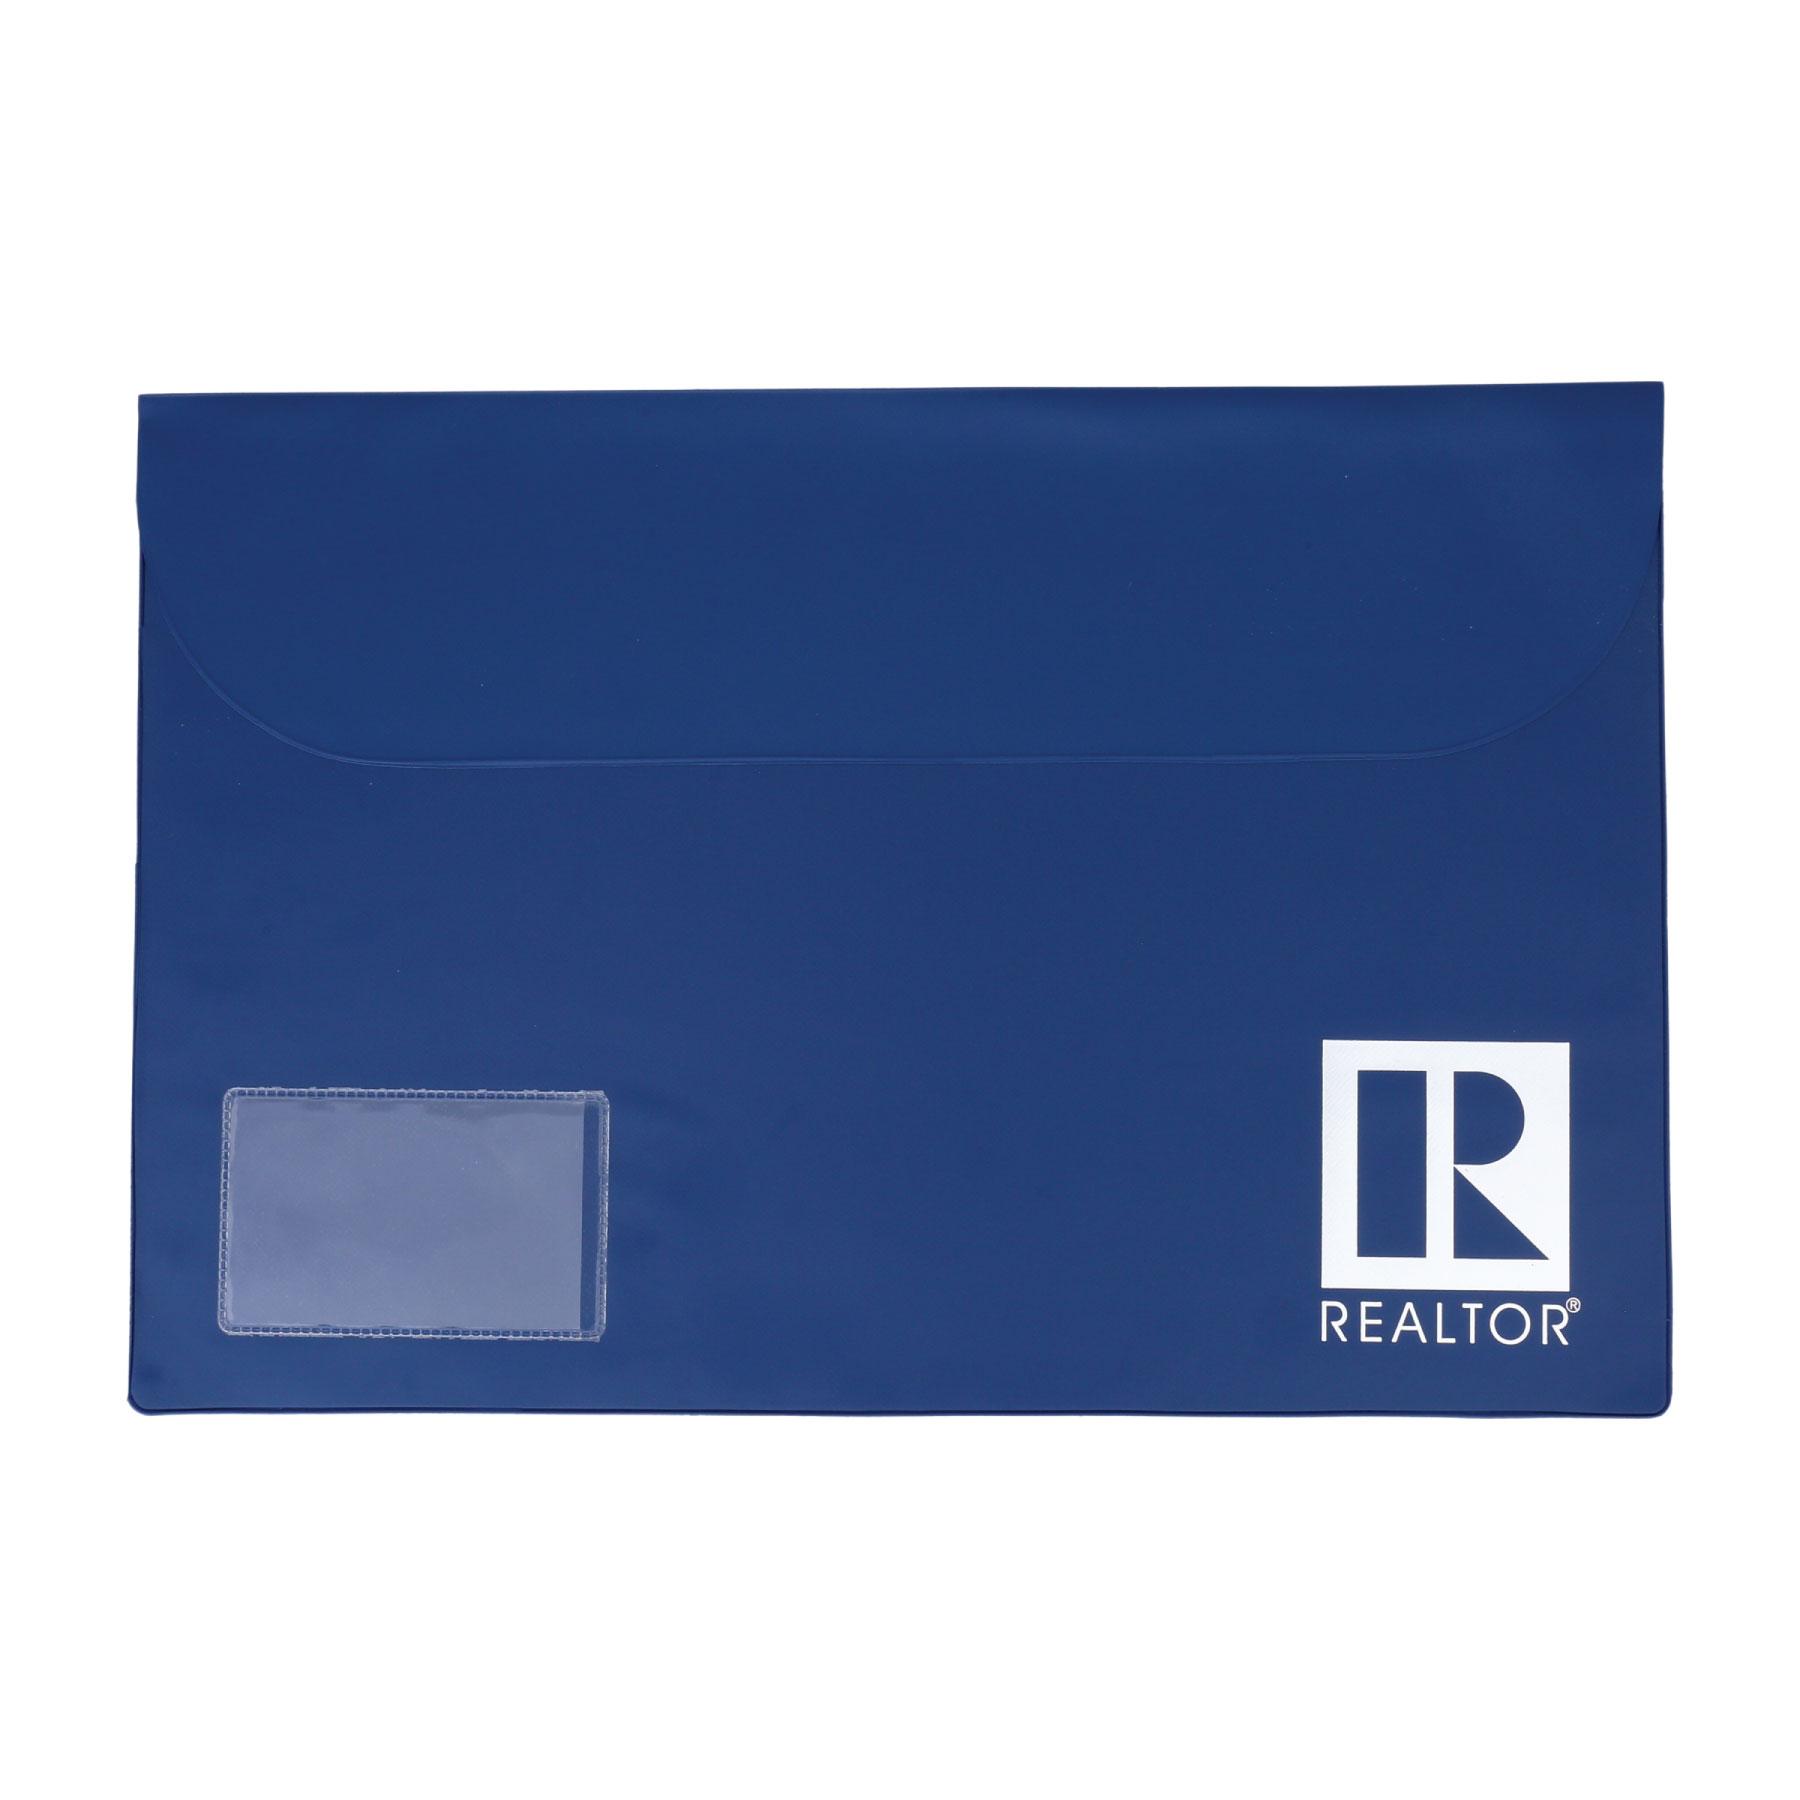 Legal Vinyl Folio with Business Card Pocket Economy,Portfolios,Holders,Pouches,Files,Documents,Closings,Letters,Padfolio,Papers,Documents,Pouch